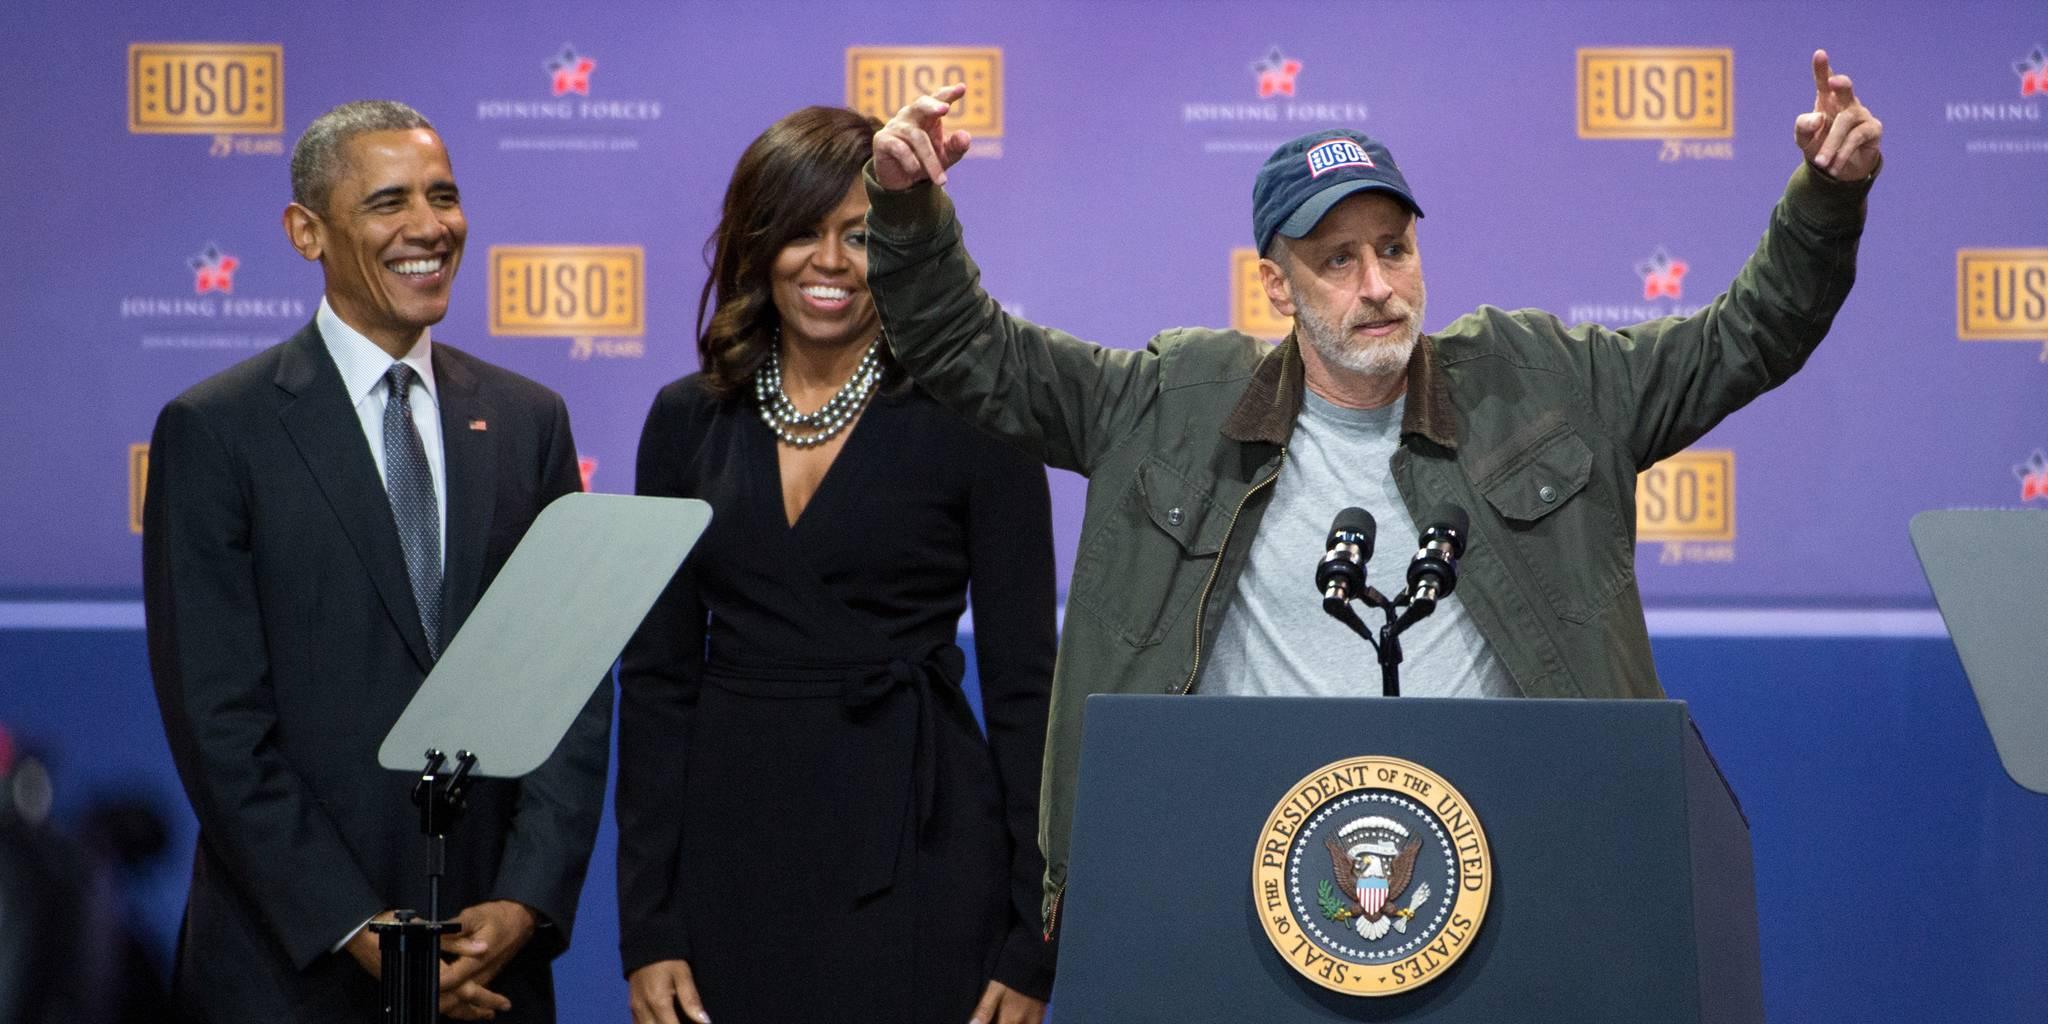 jon stewart with the obamas